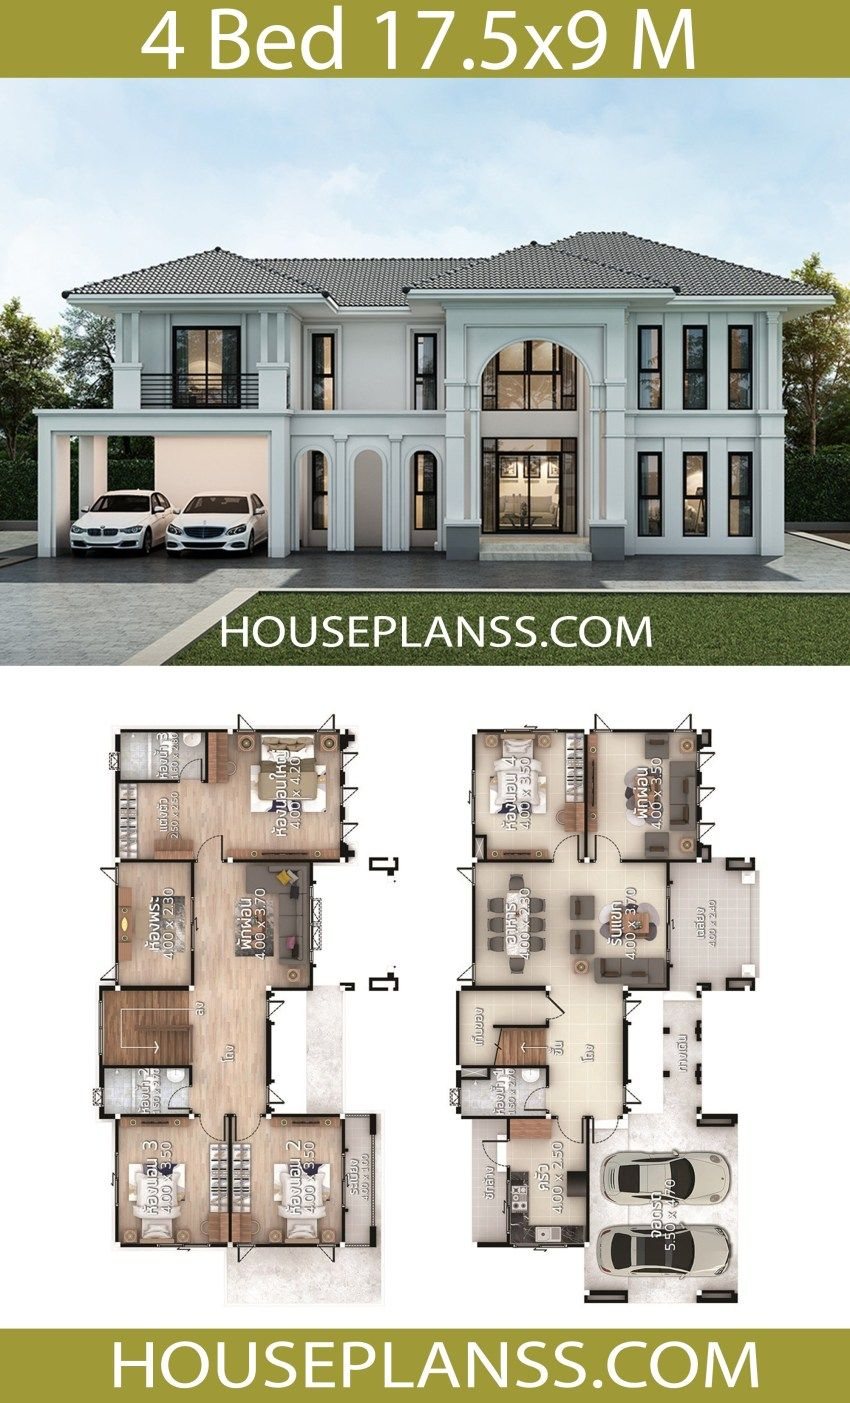 House Plans Idea 17 5x9 With 4 Bedrooms House Blueprints Architectural House Plans Sims House Design